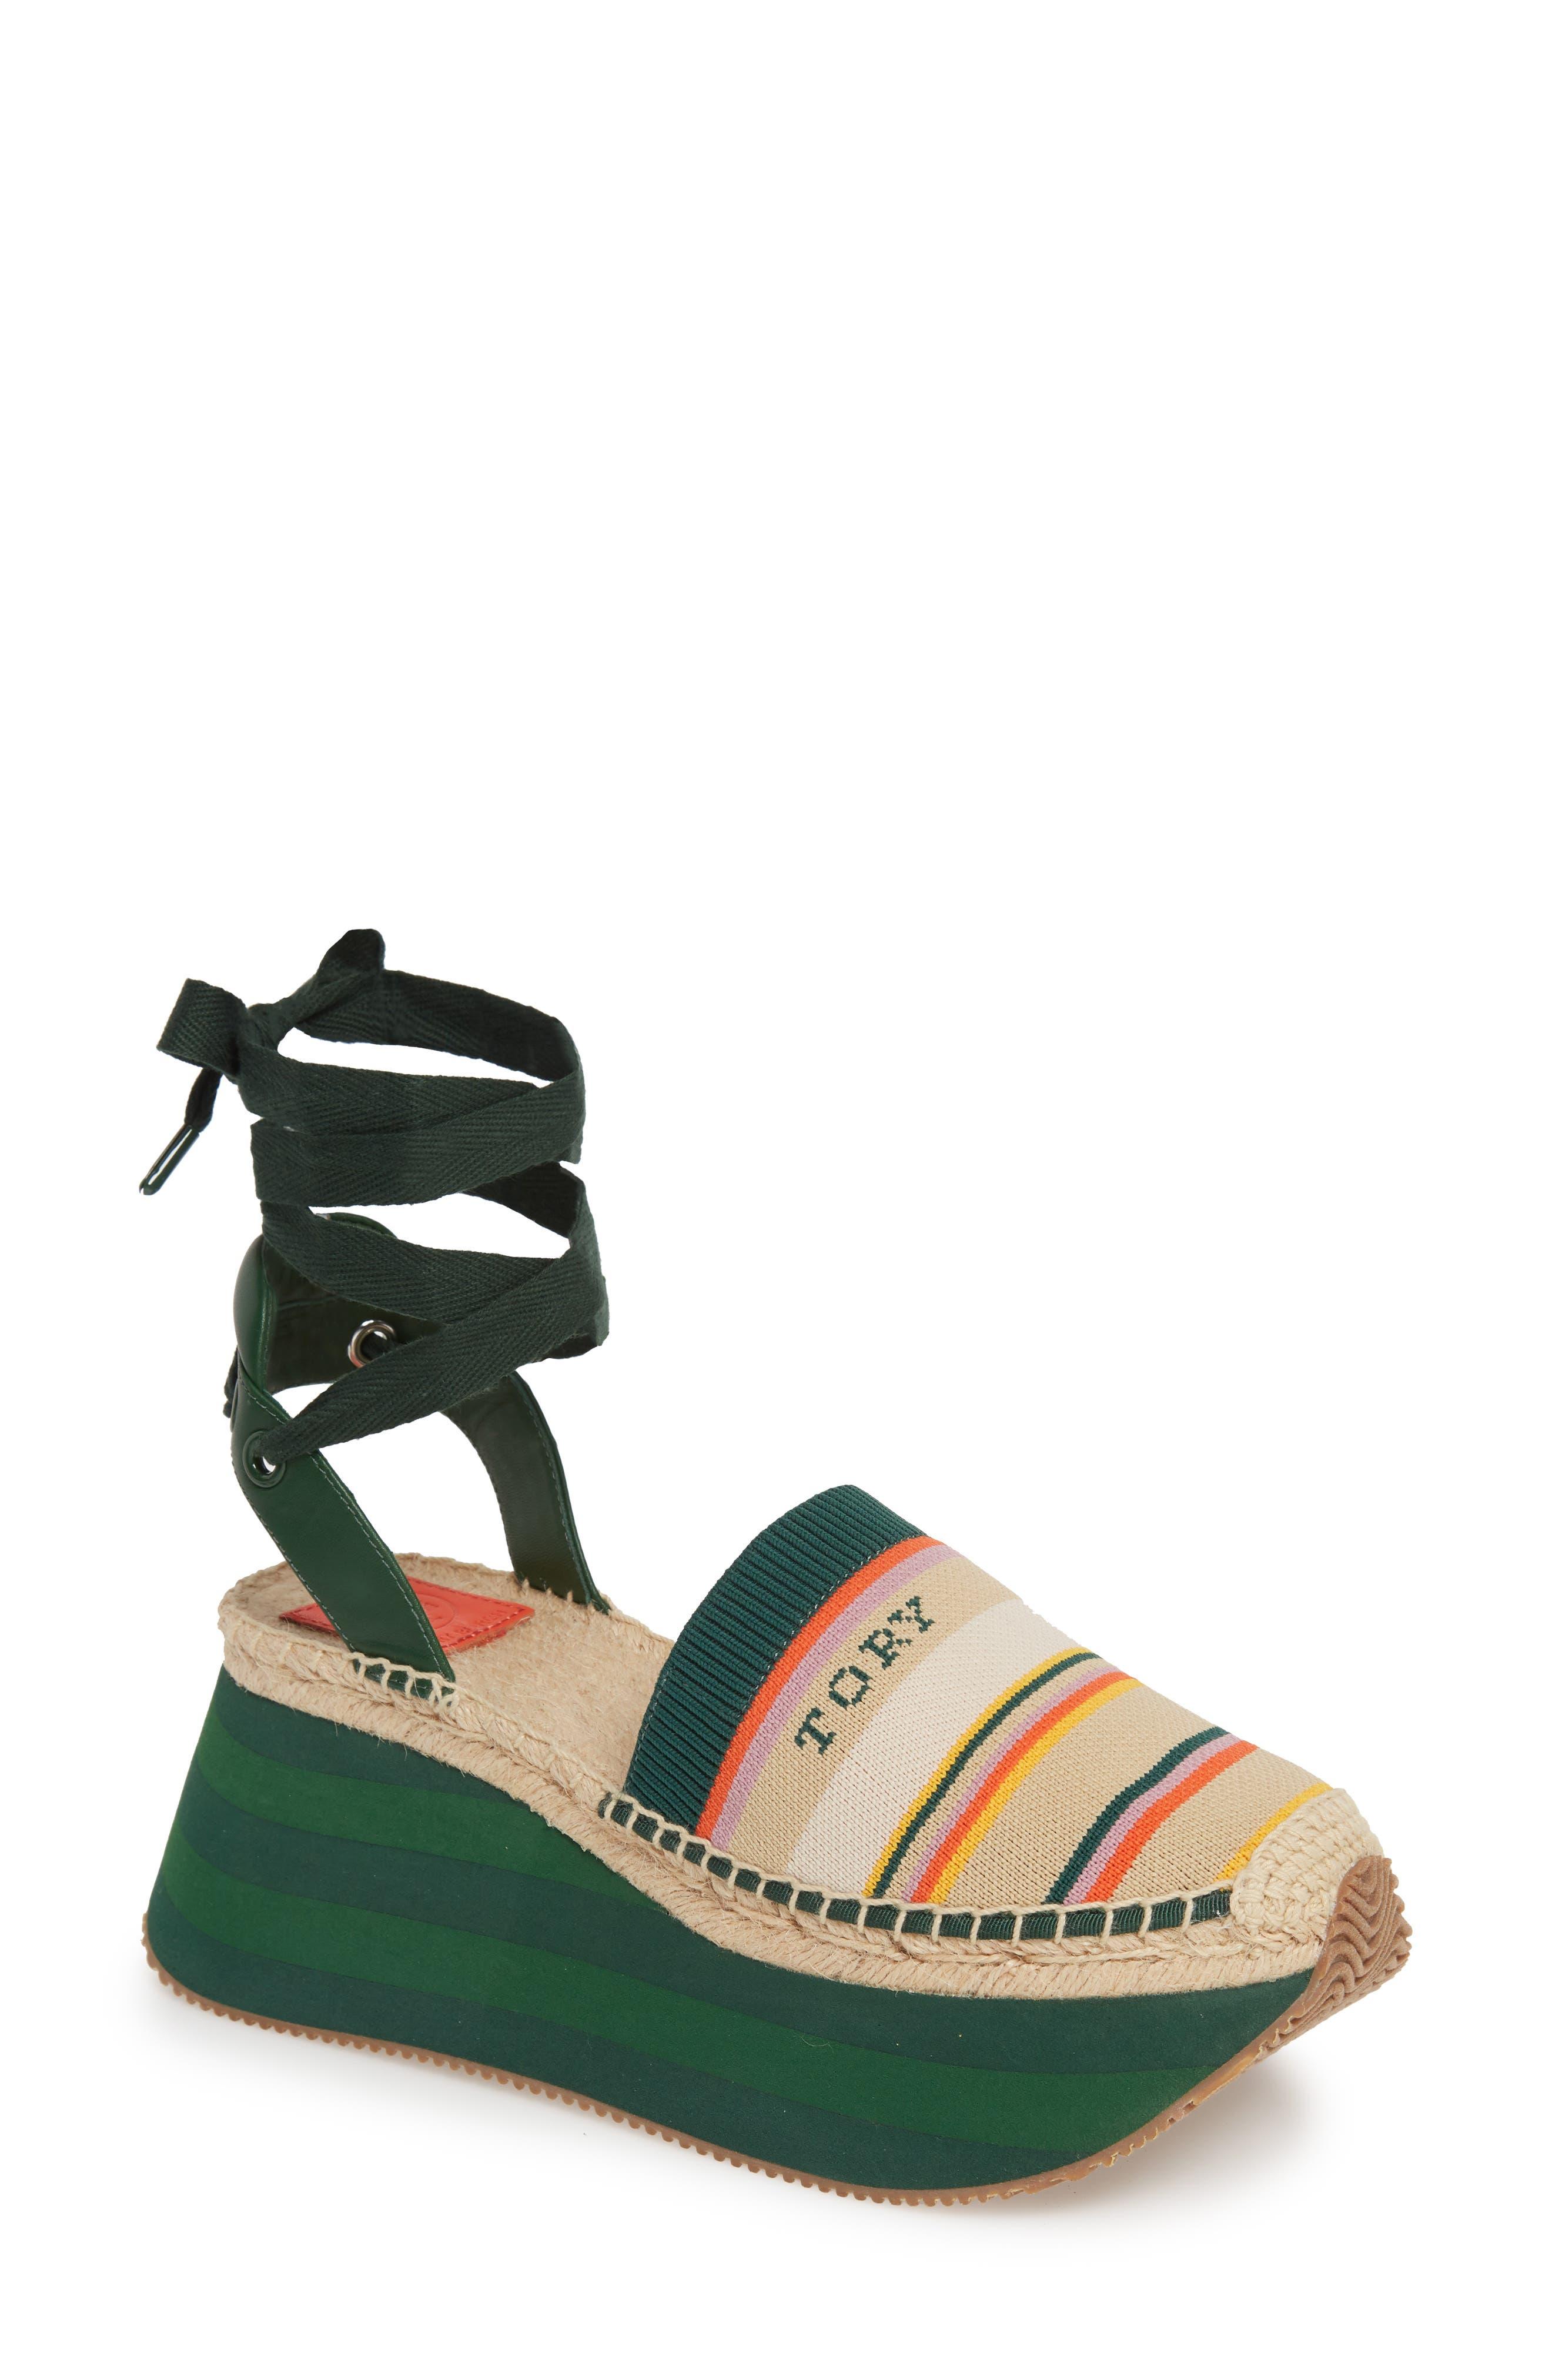 Tory Burch Daisy Lace-Up Platform Shoe, Green